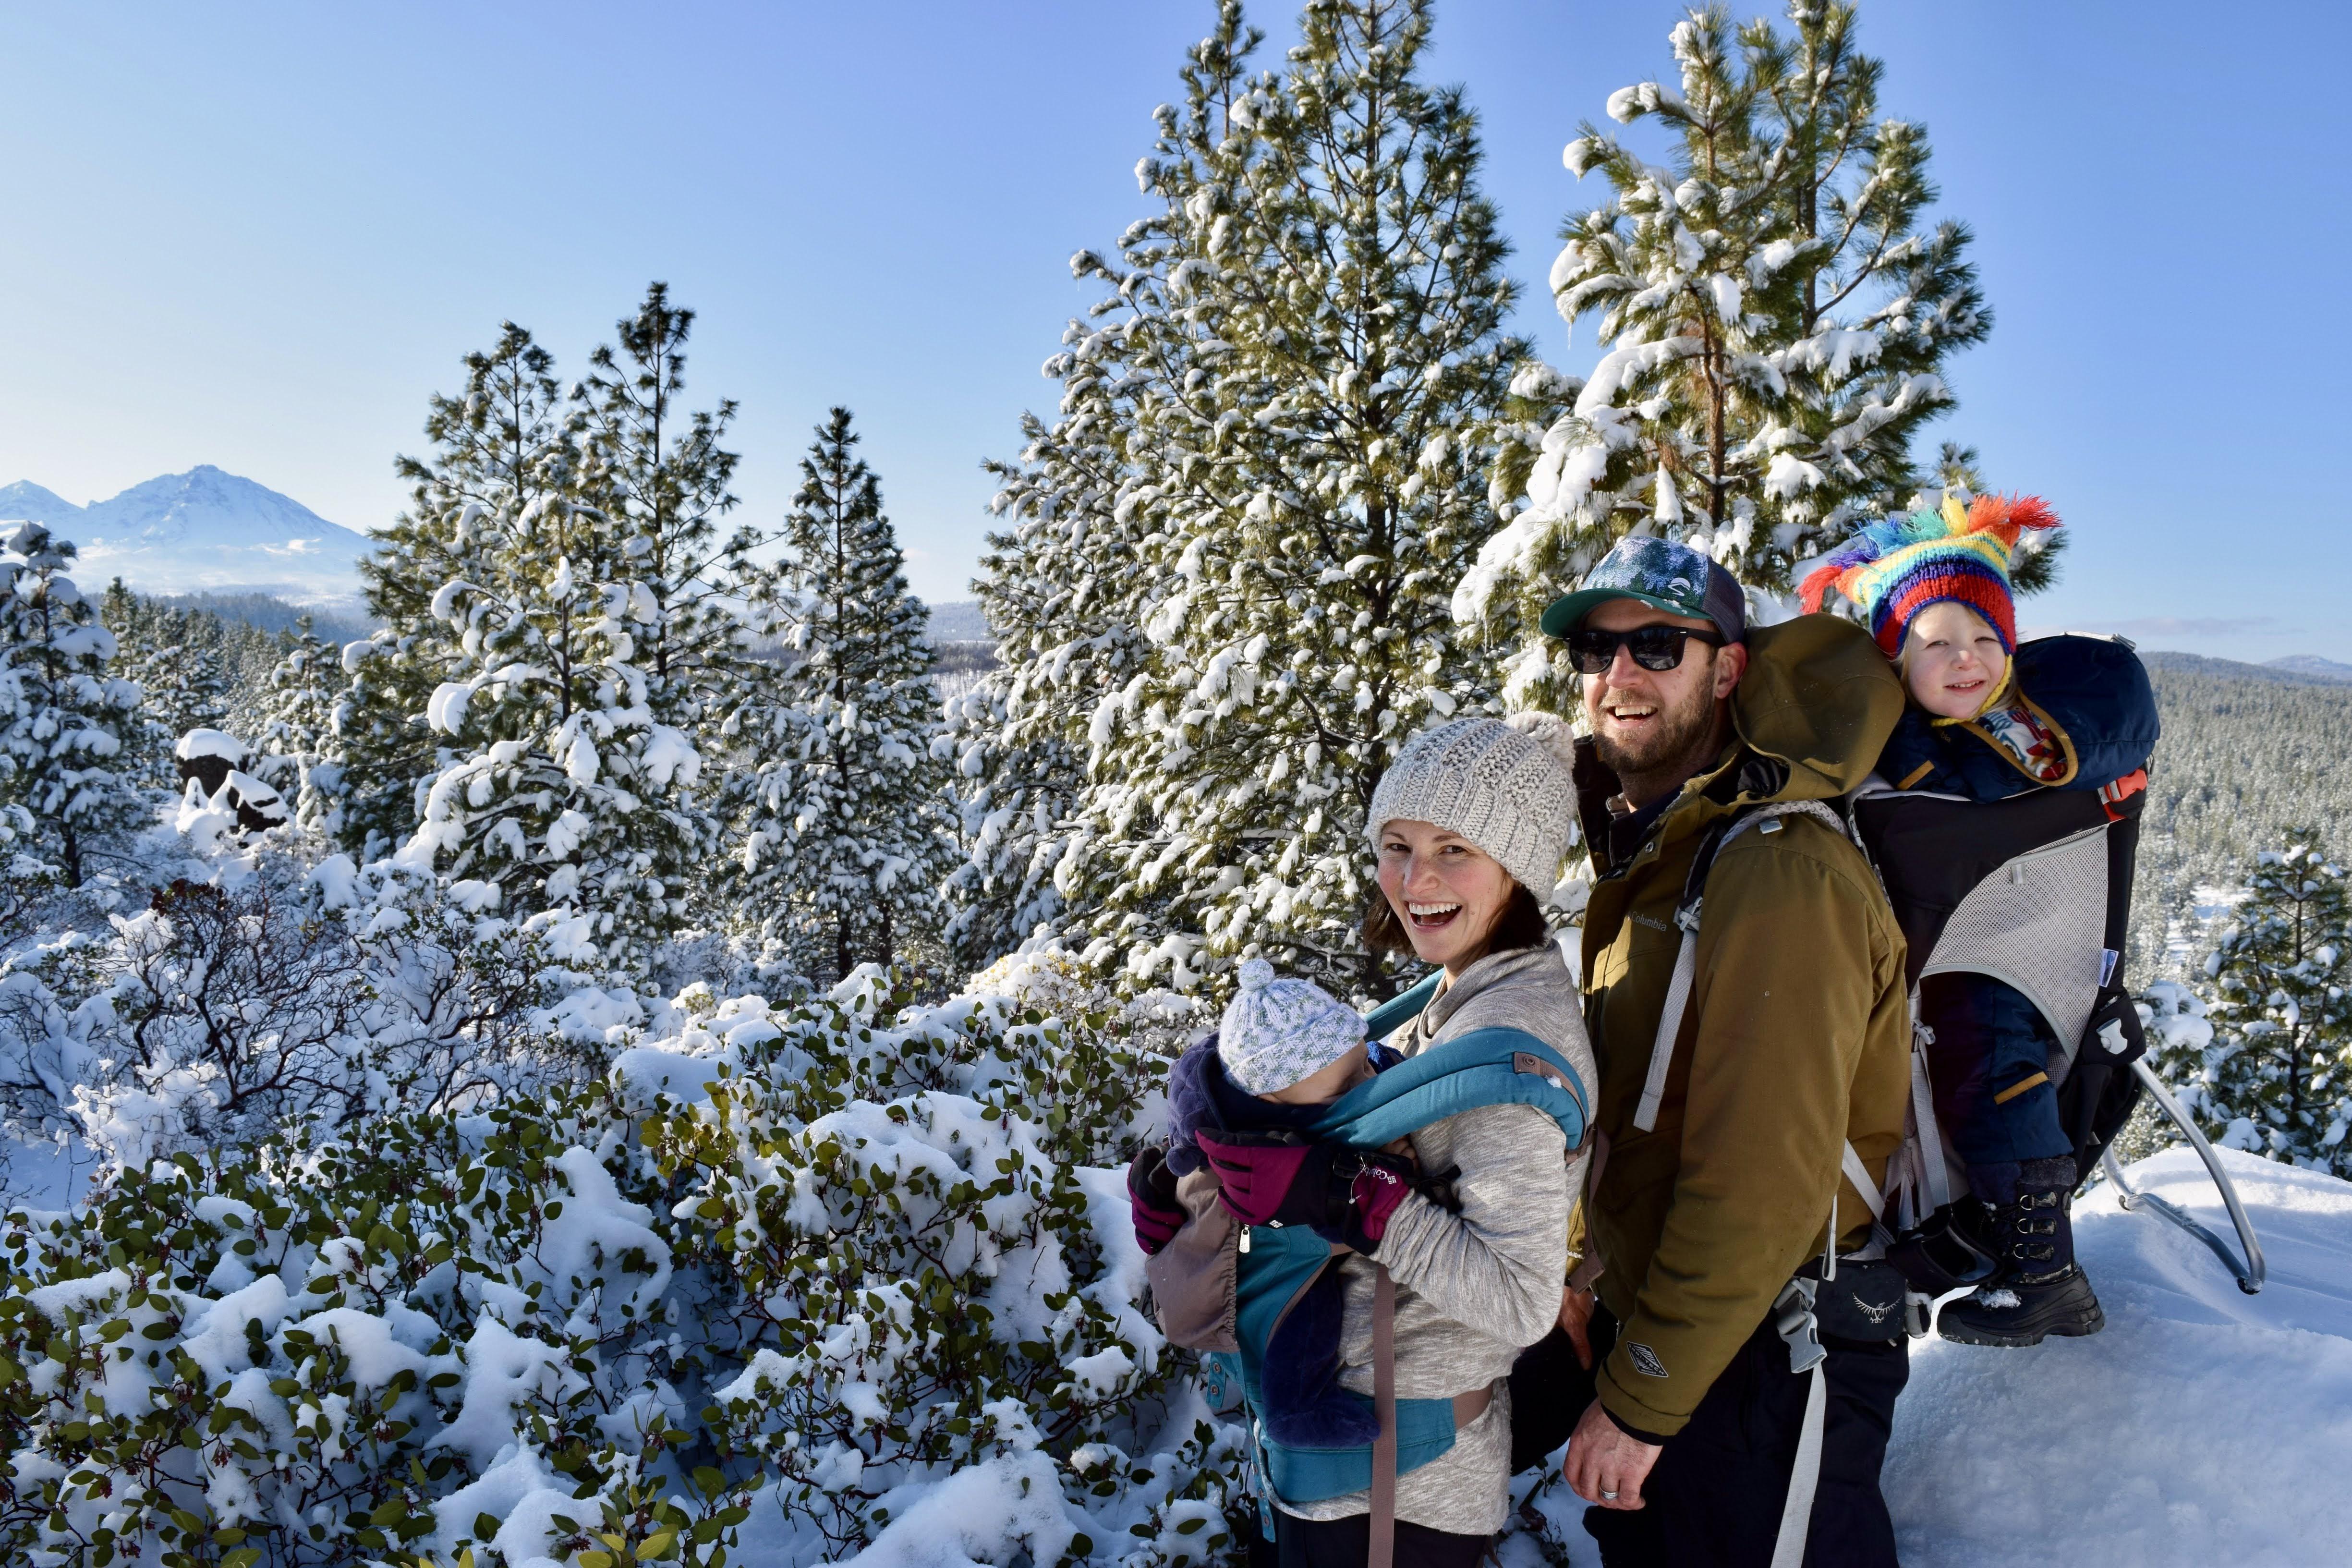 Image of Ryan LaPoma and Family